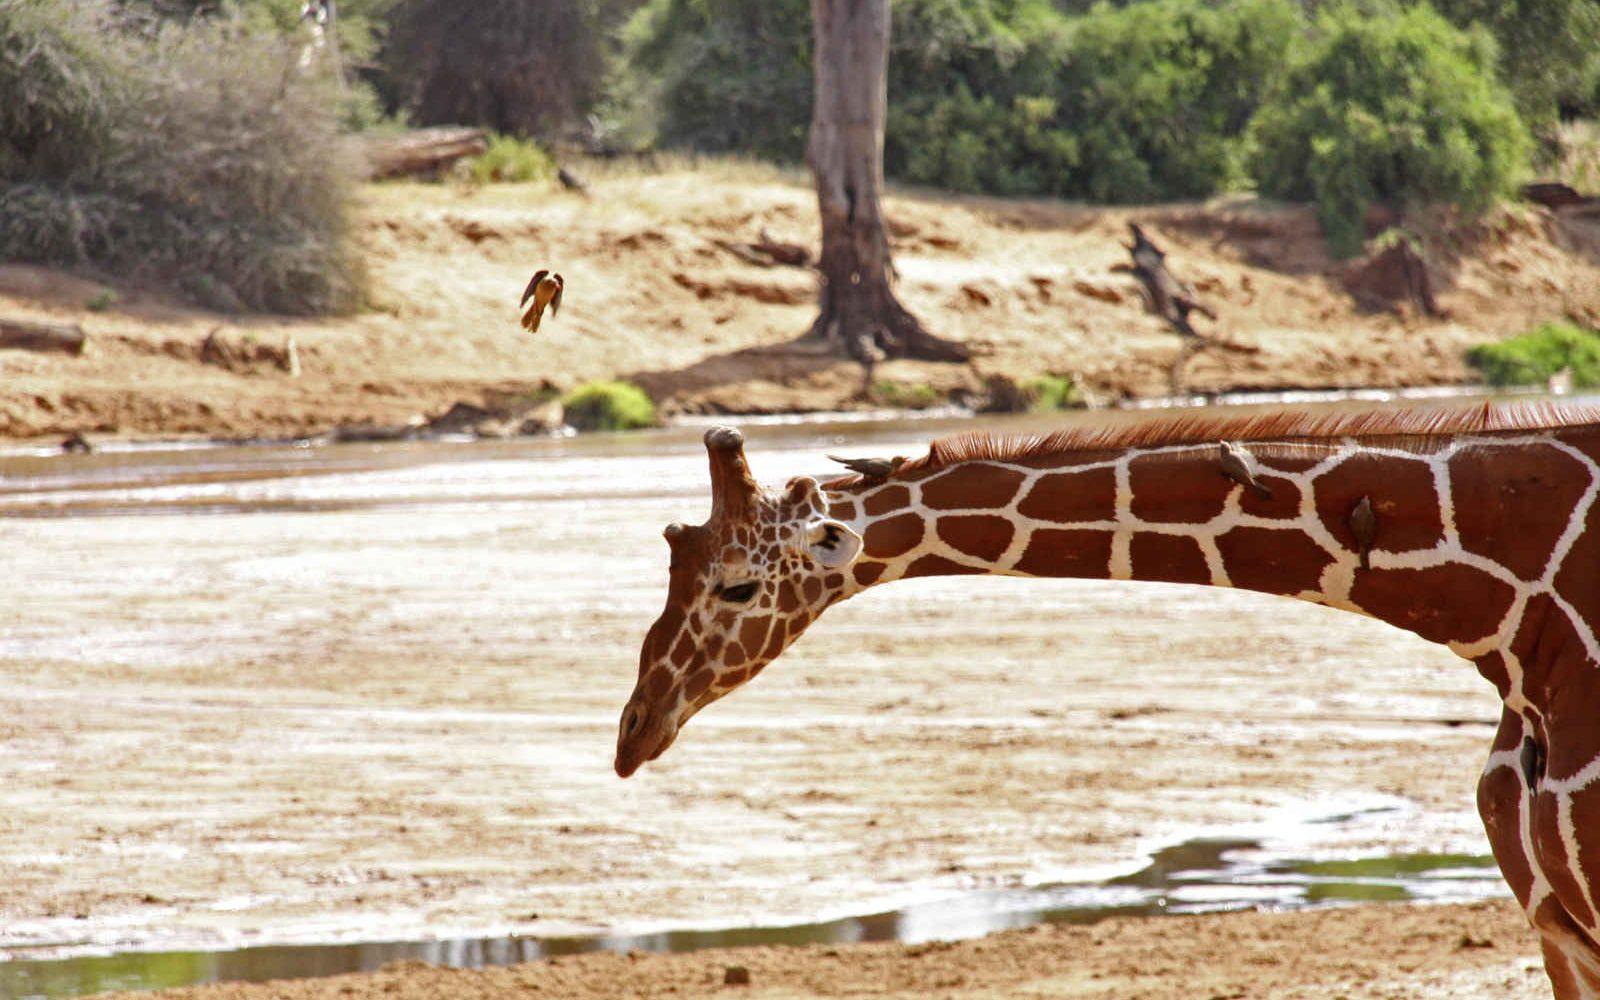 Girafe, Samburu national reserve, Kenya